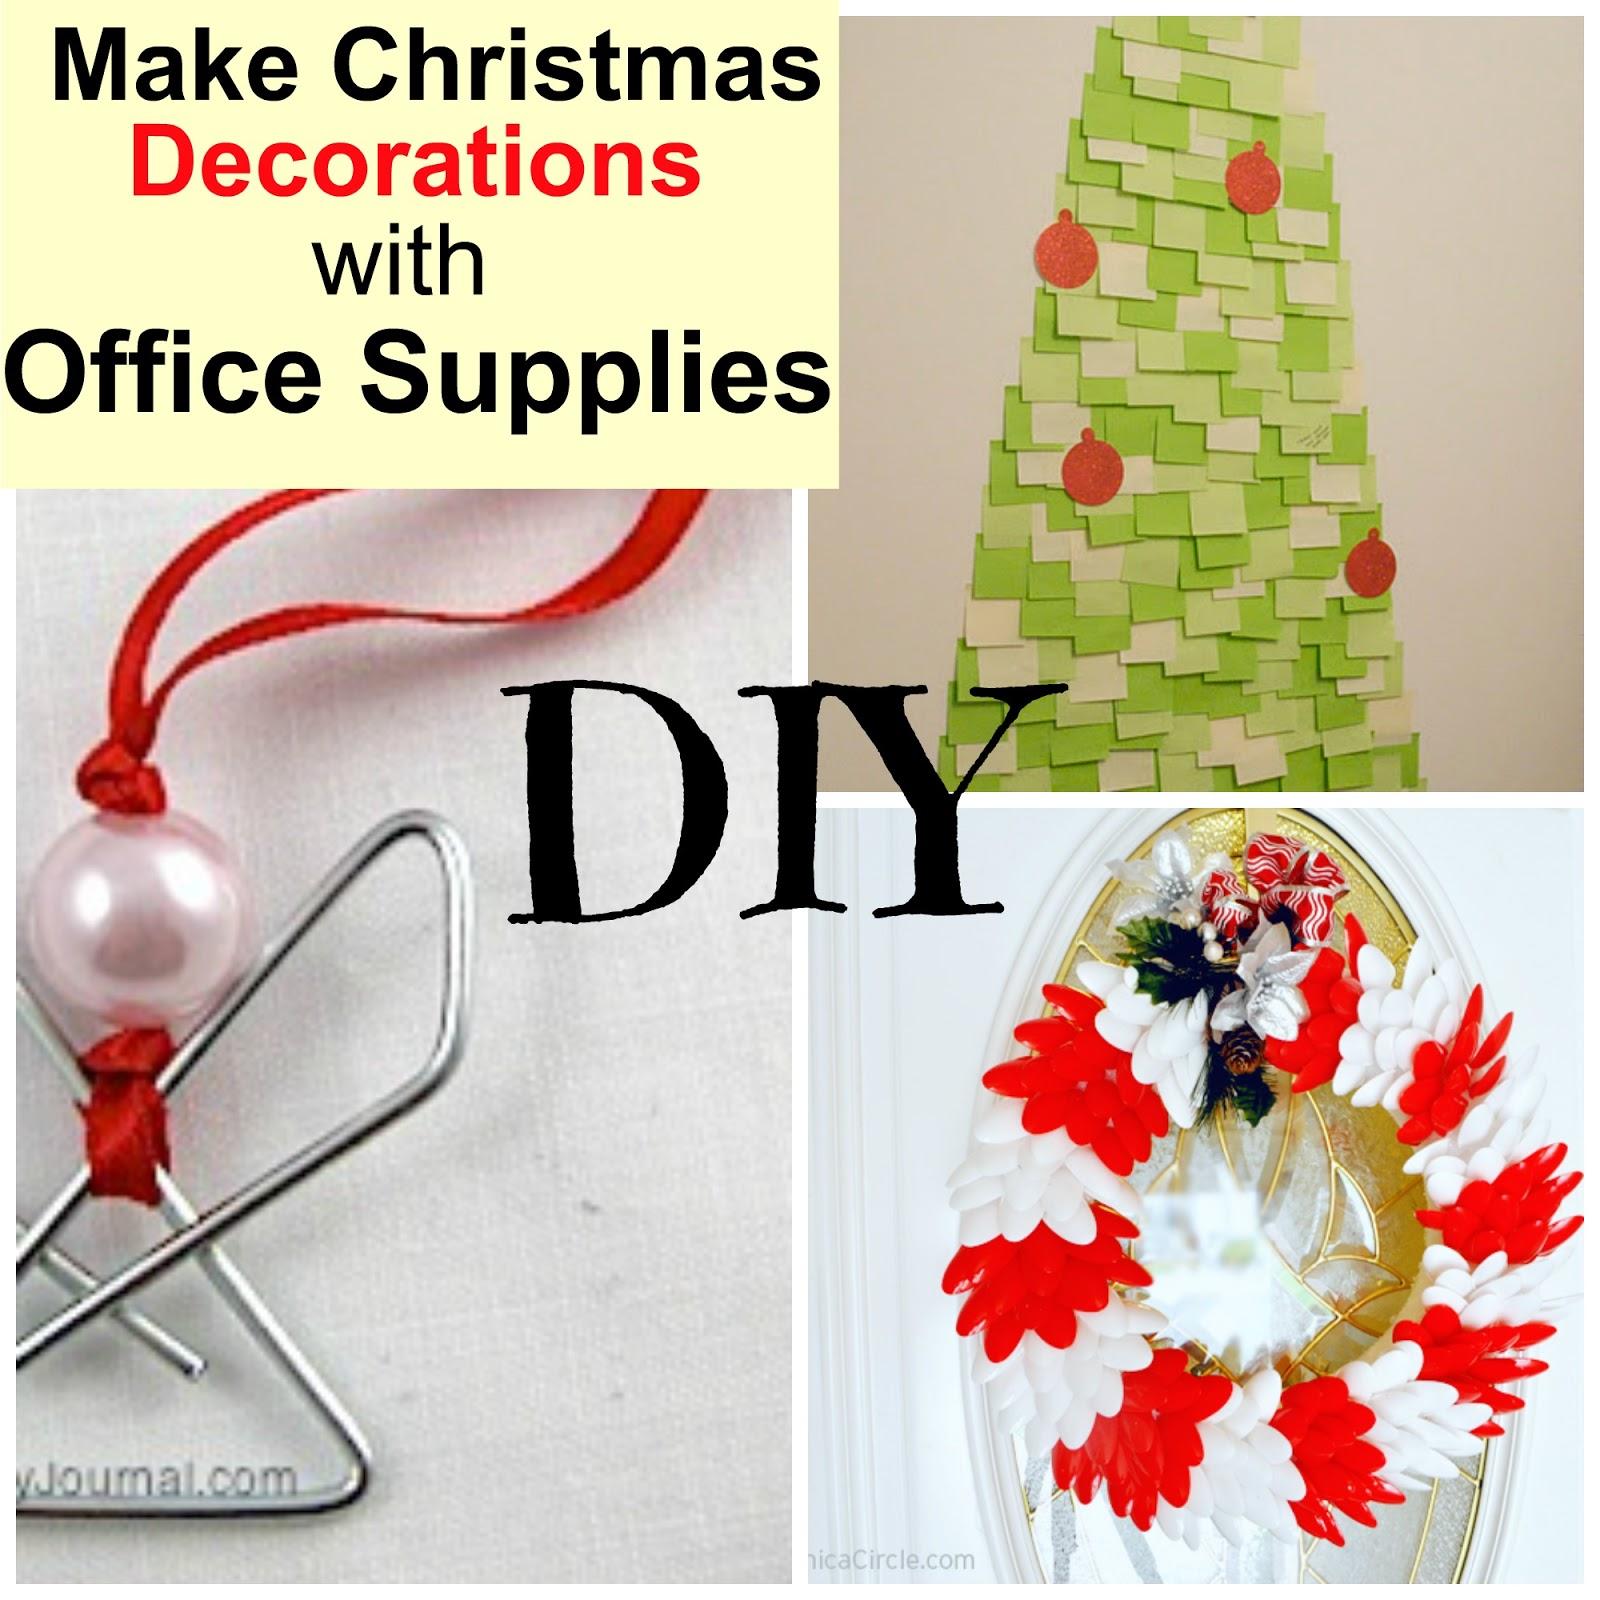 DIY Office Supplies Christmas Decorations | Christmas Wikii